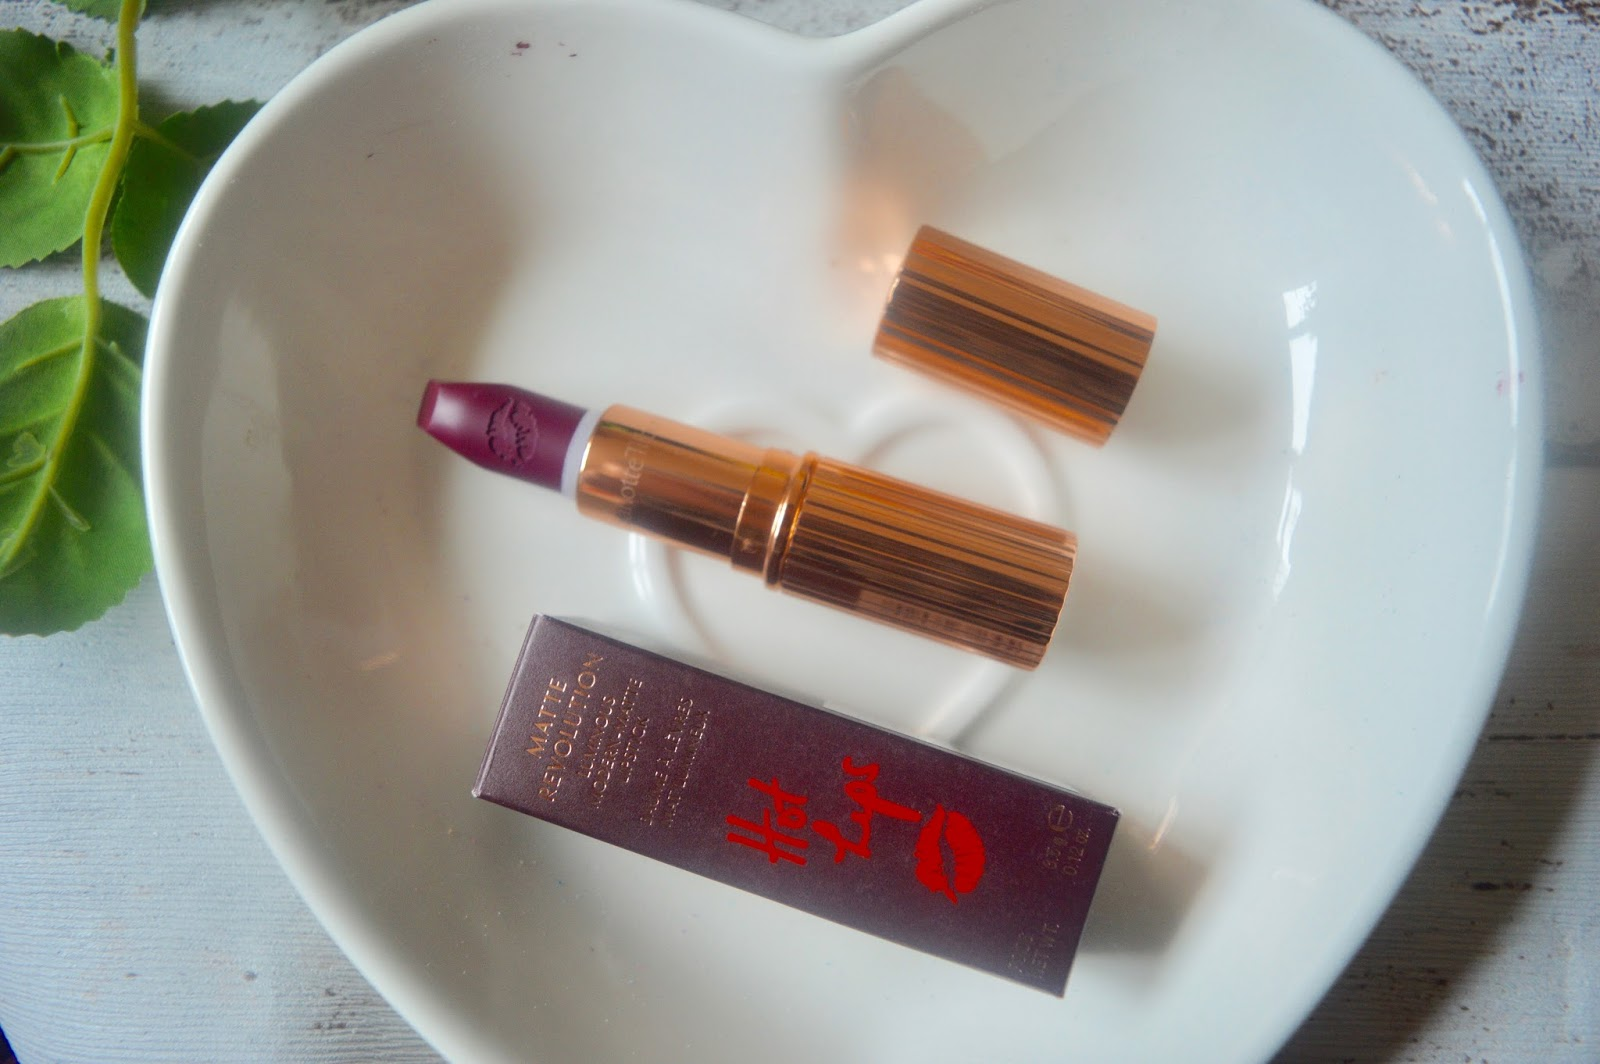 charlotte tilbury hel's bells lipstick review